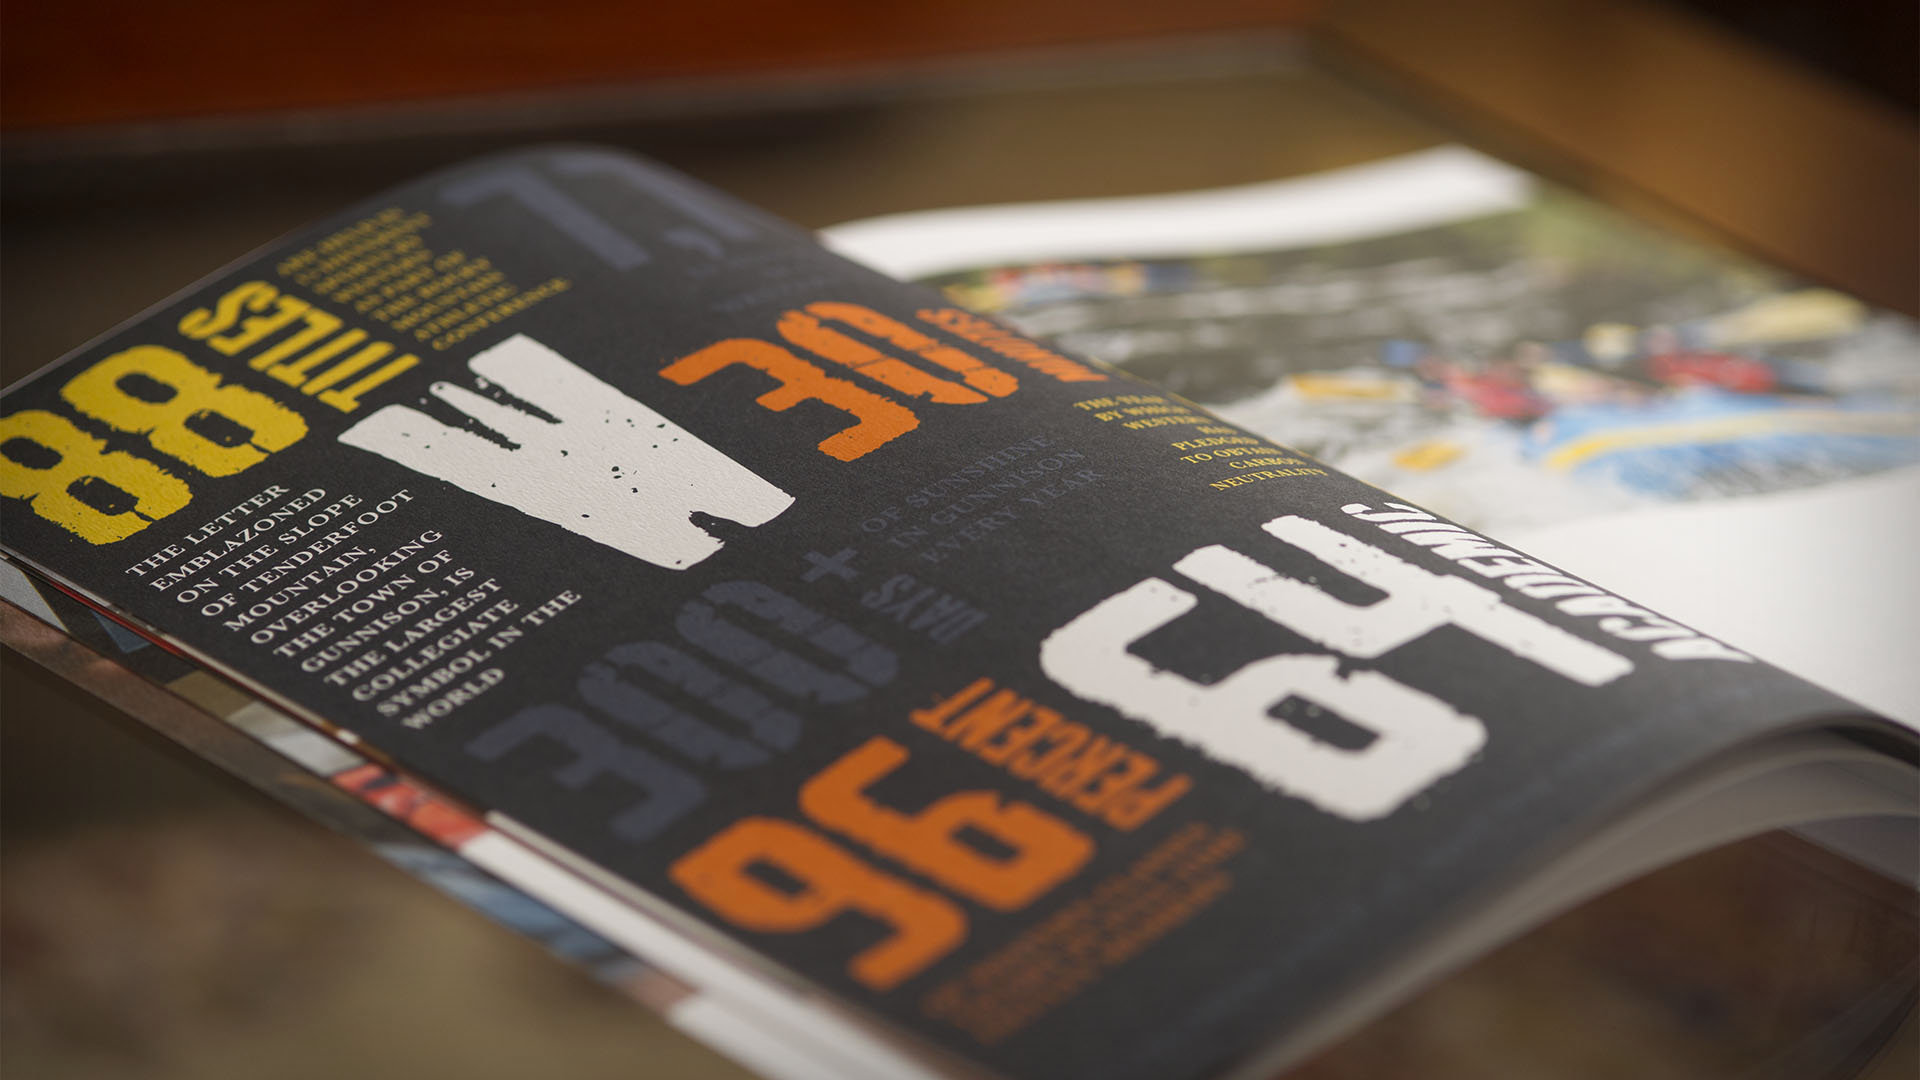 Western-State-Colorado-University-Branding-Marketing-Admissions-Viewbook-1.jpg